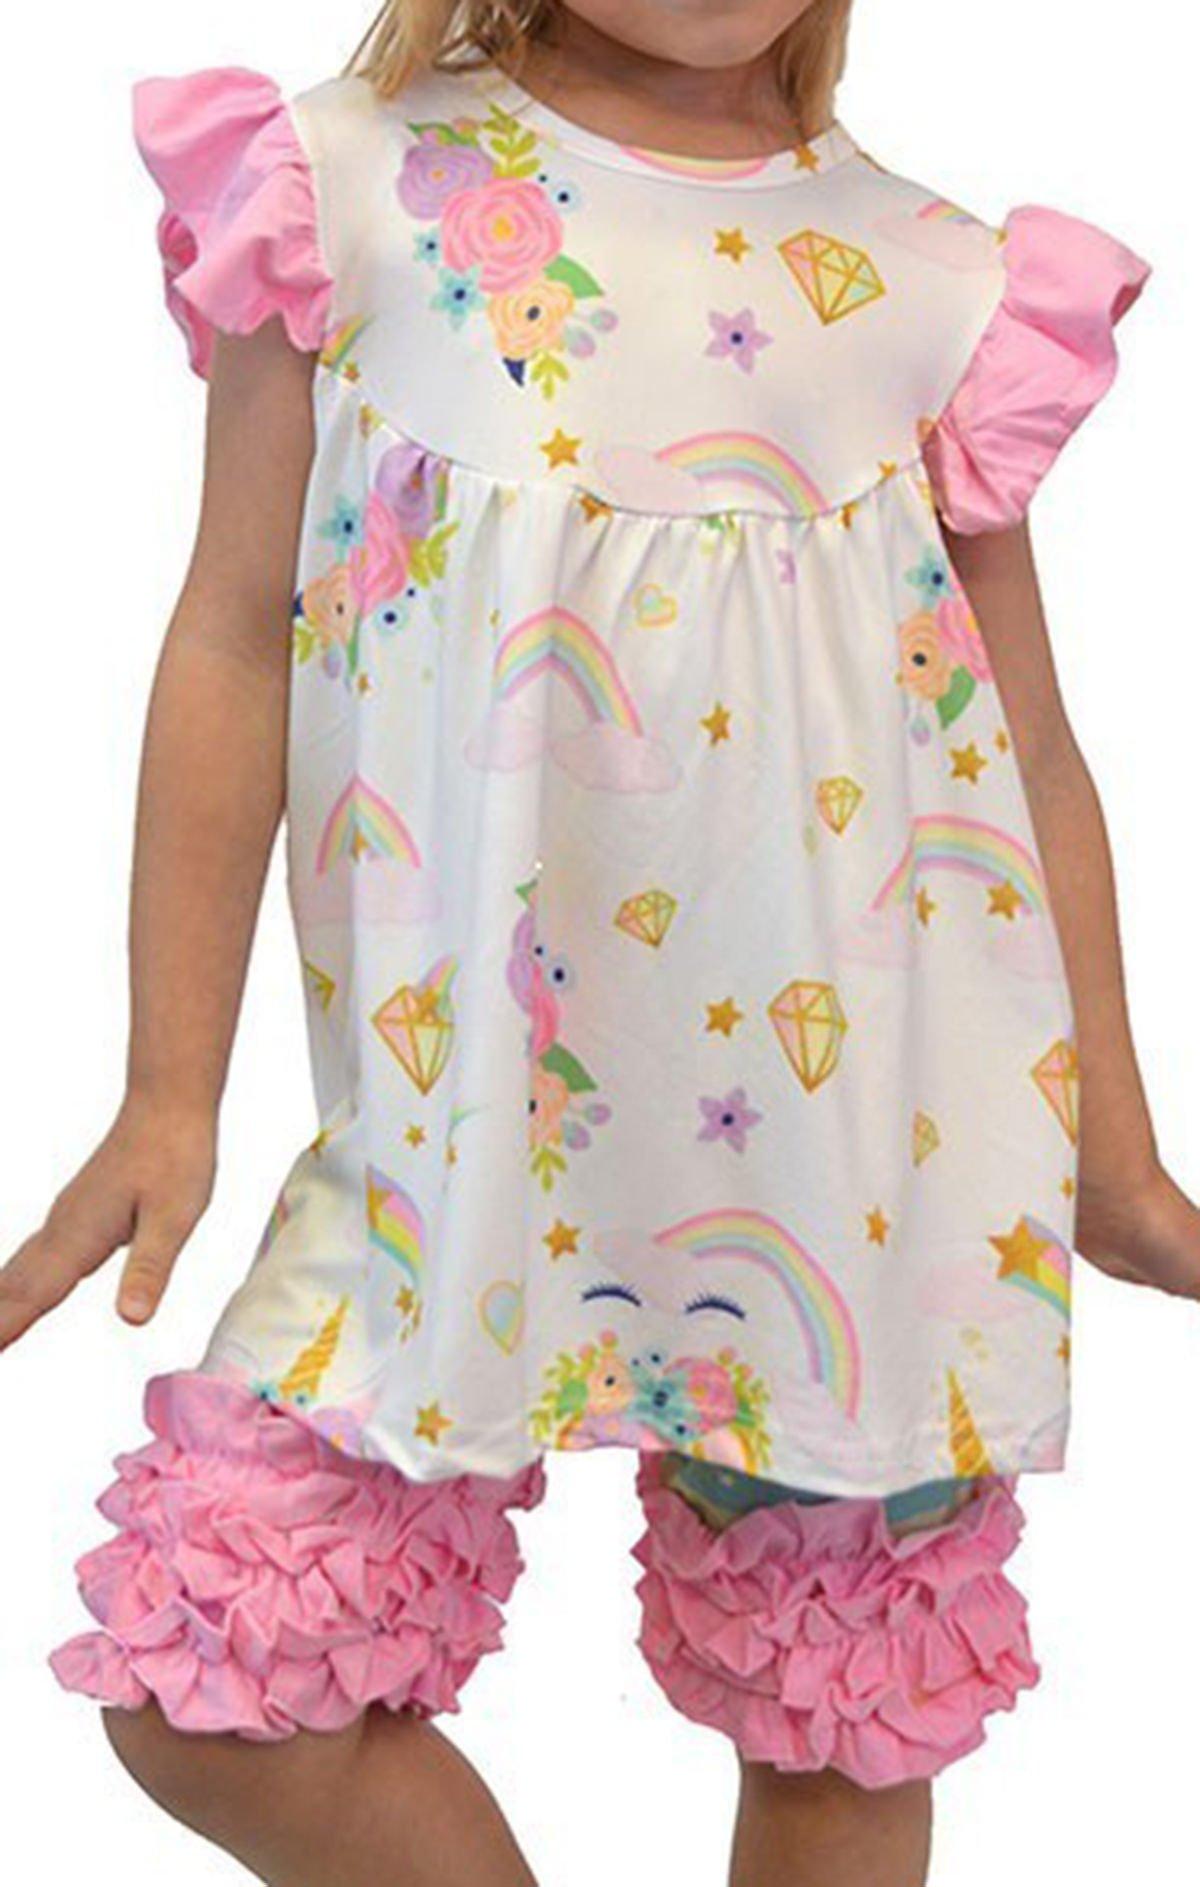 BluNight Collection Big Girls 2 Pieces Pant Set Unicorn Dress Ruffle Outfit Clothing Set Off White 7 XXL (501323)